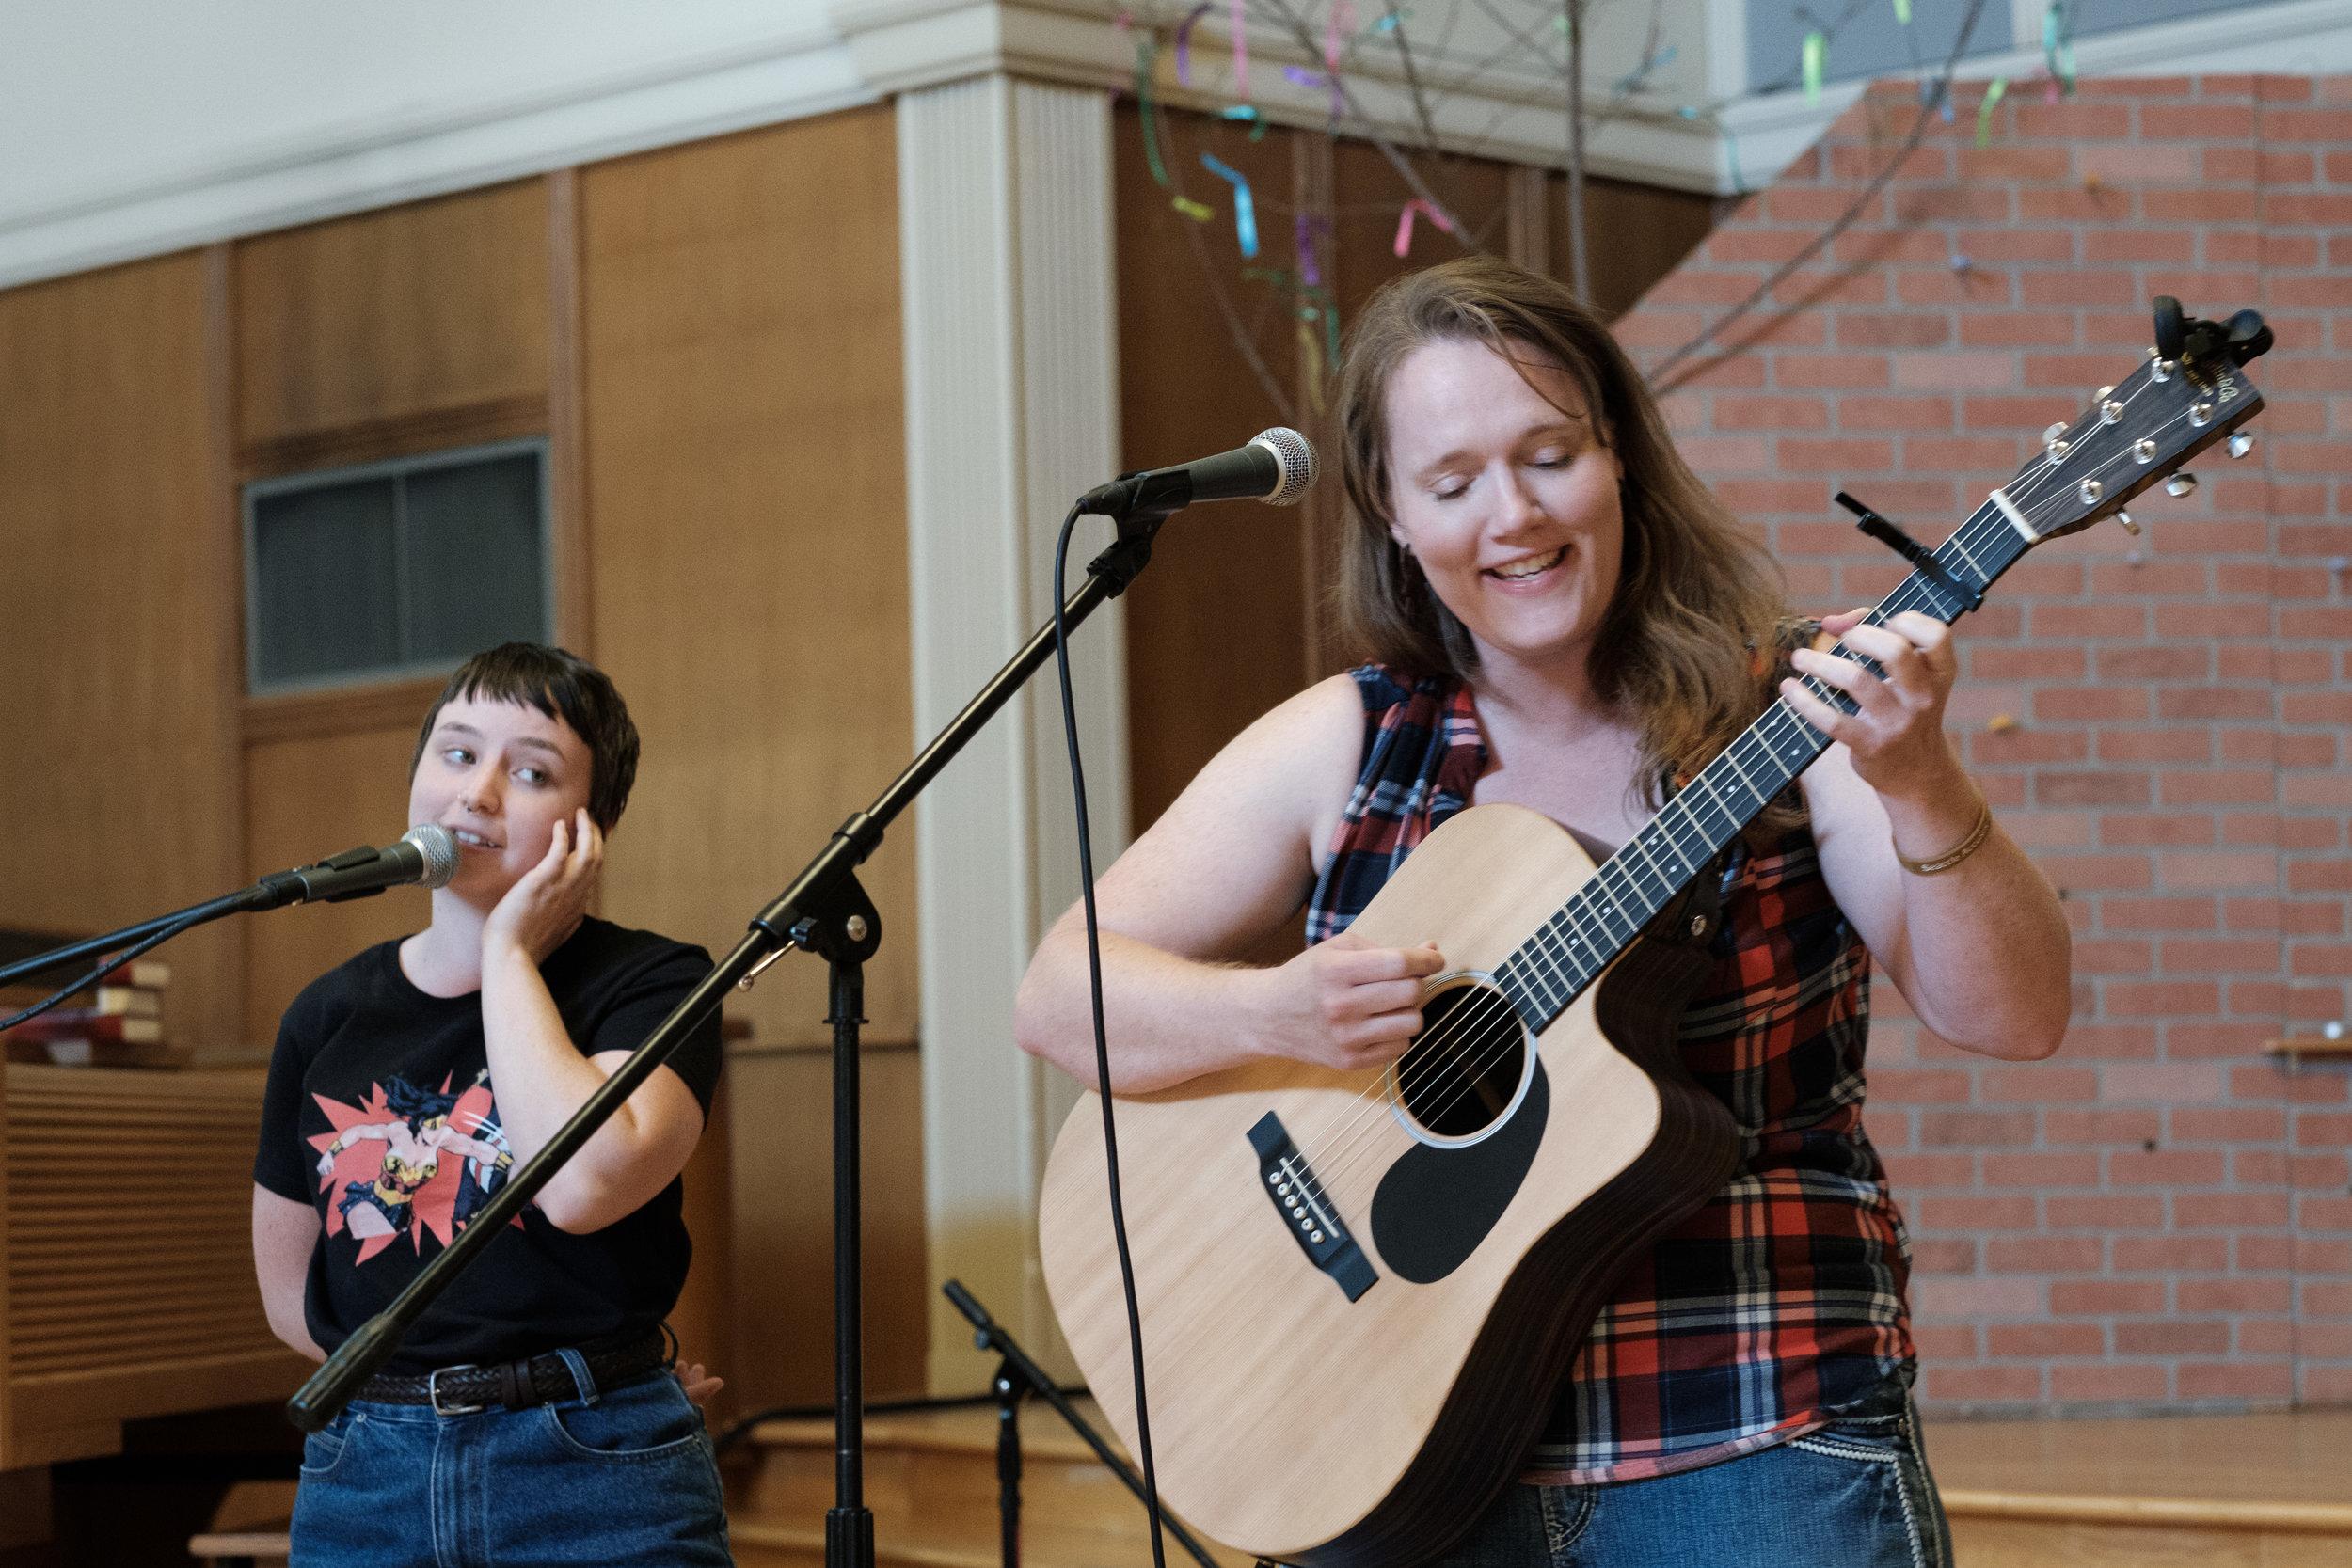 Sandi Fernandez and A. Greene, Seattle Acoustic Festival 2017.